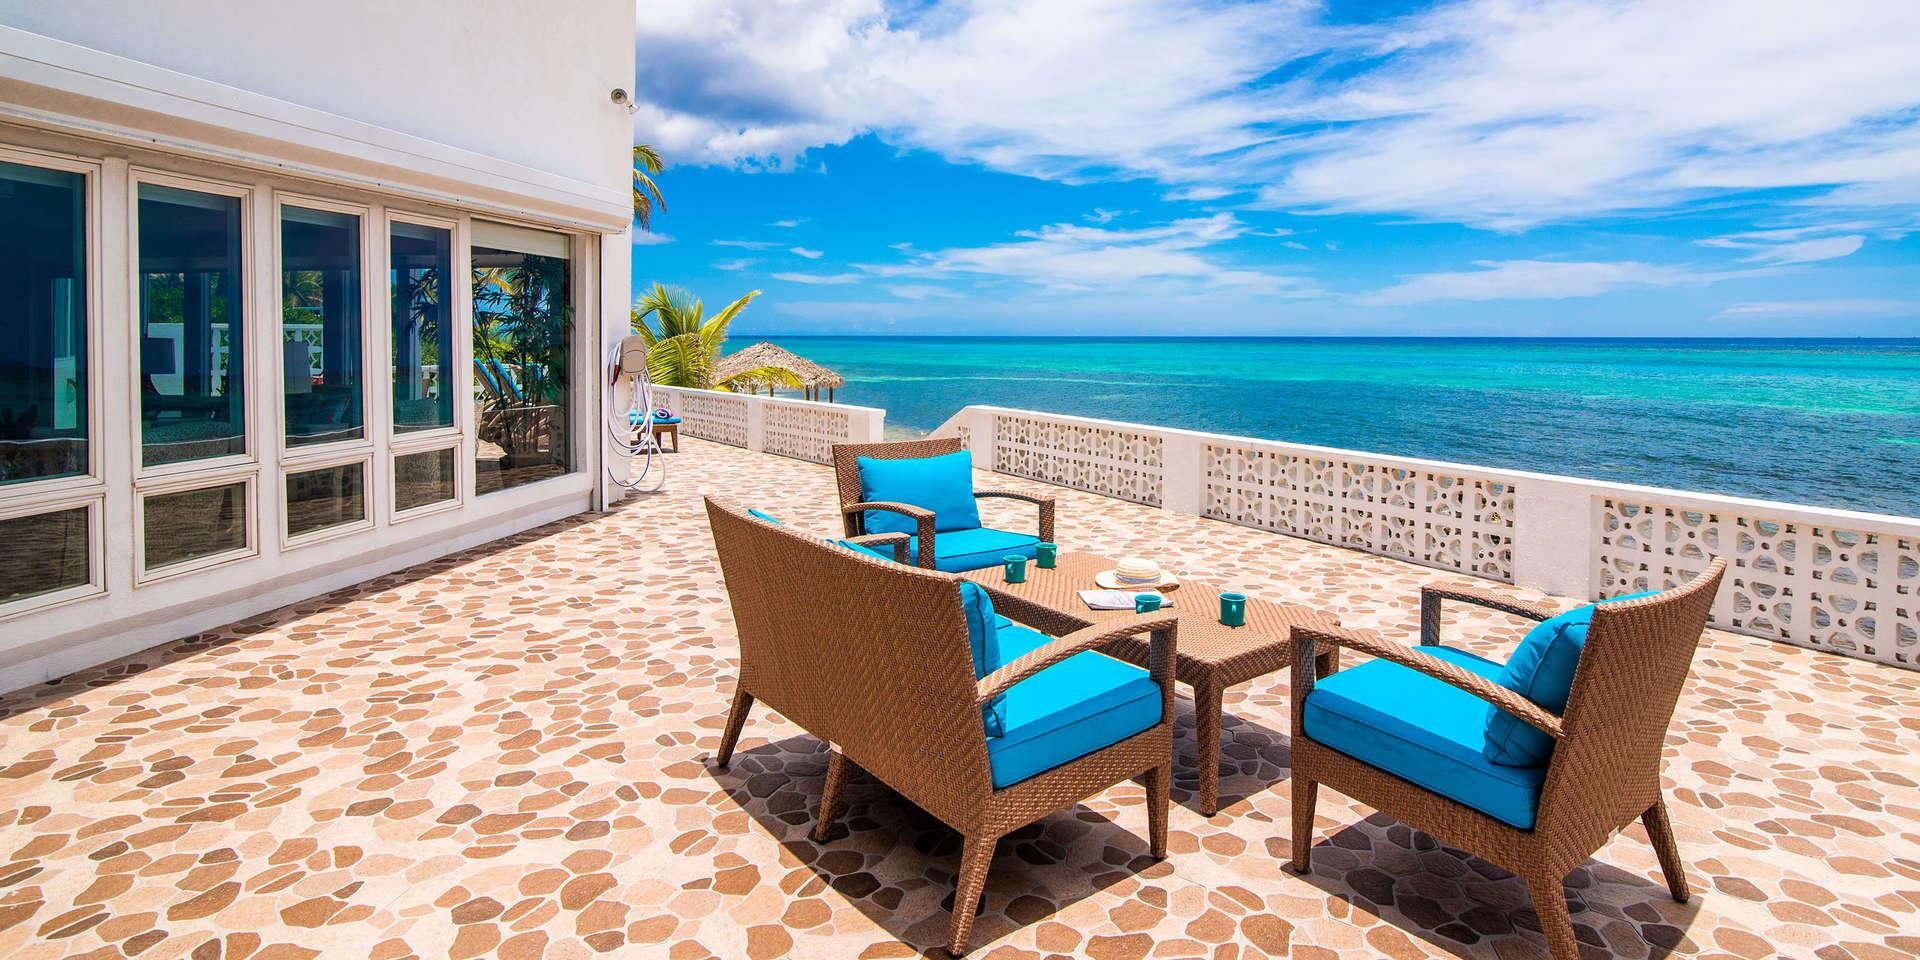 Luxury villa rentals caribbean - Cayman islands - Grand cayman - Cayman kai - Moon Glow Villa - Image 1/22